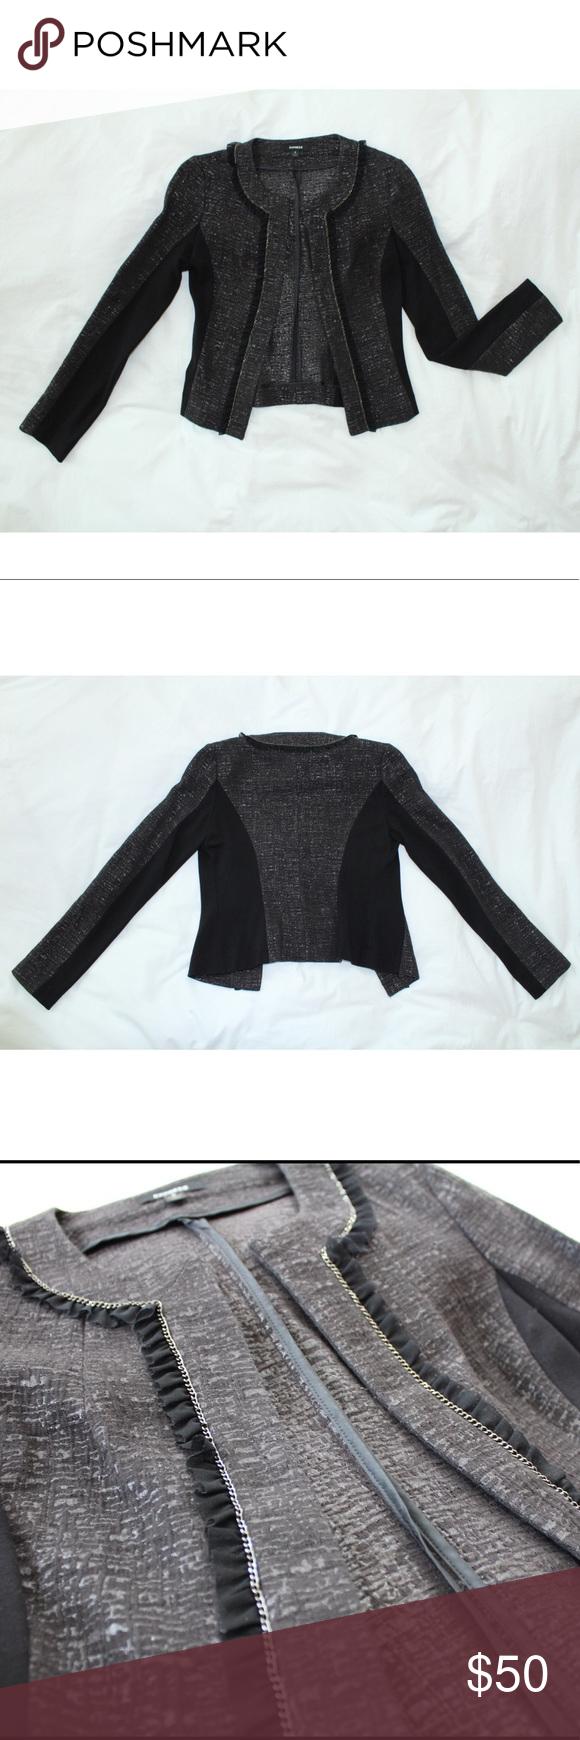 Express blazer Clothes design, Fashion, Fashion